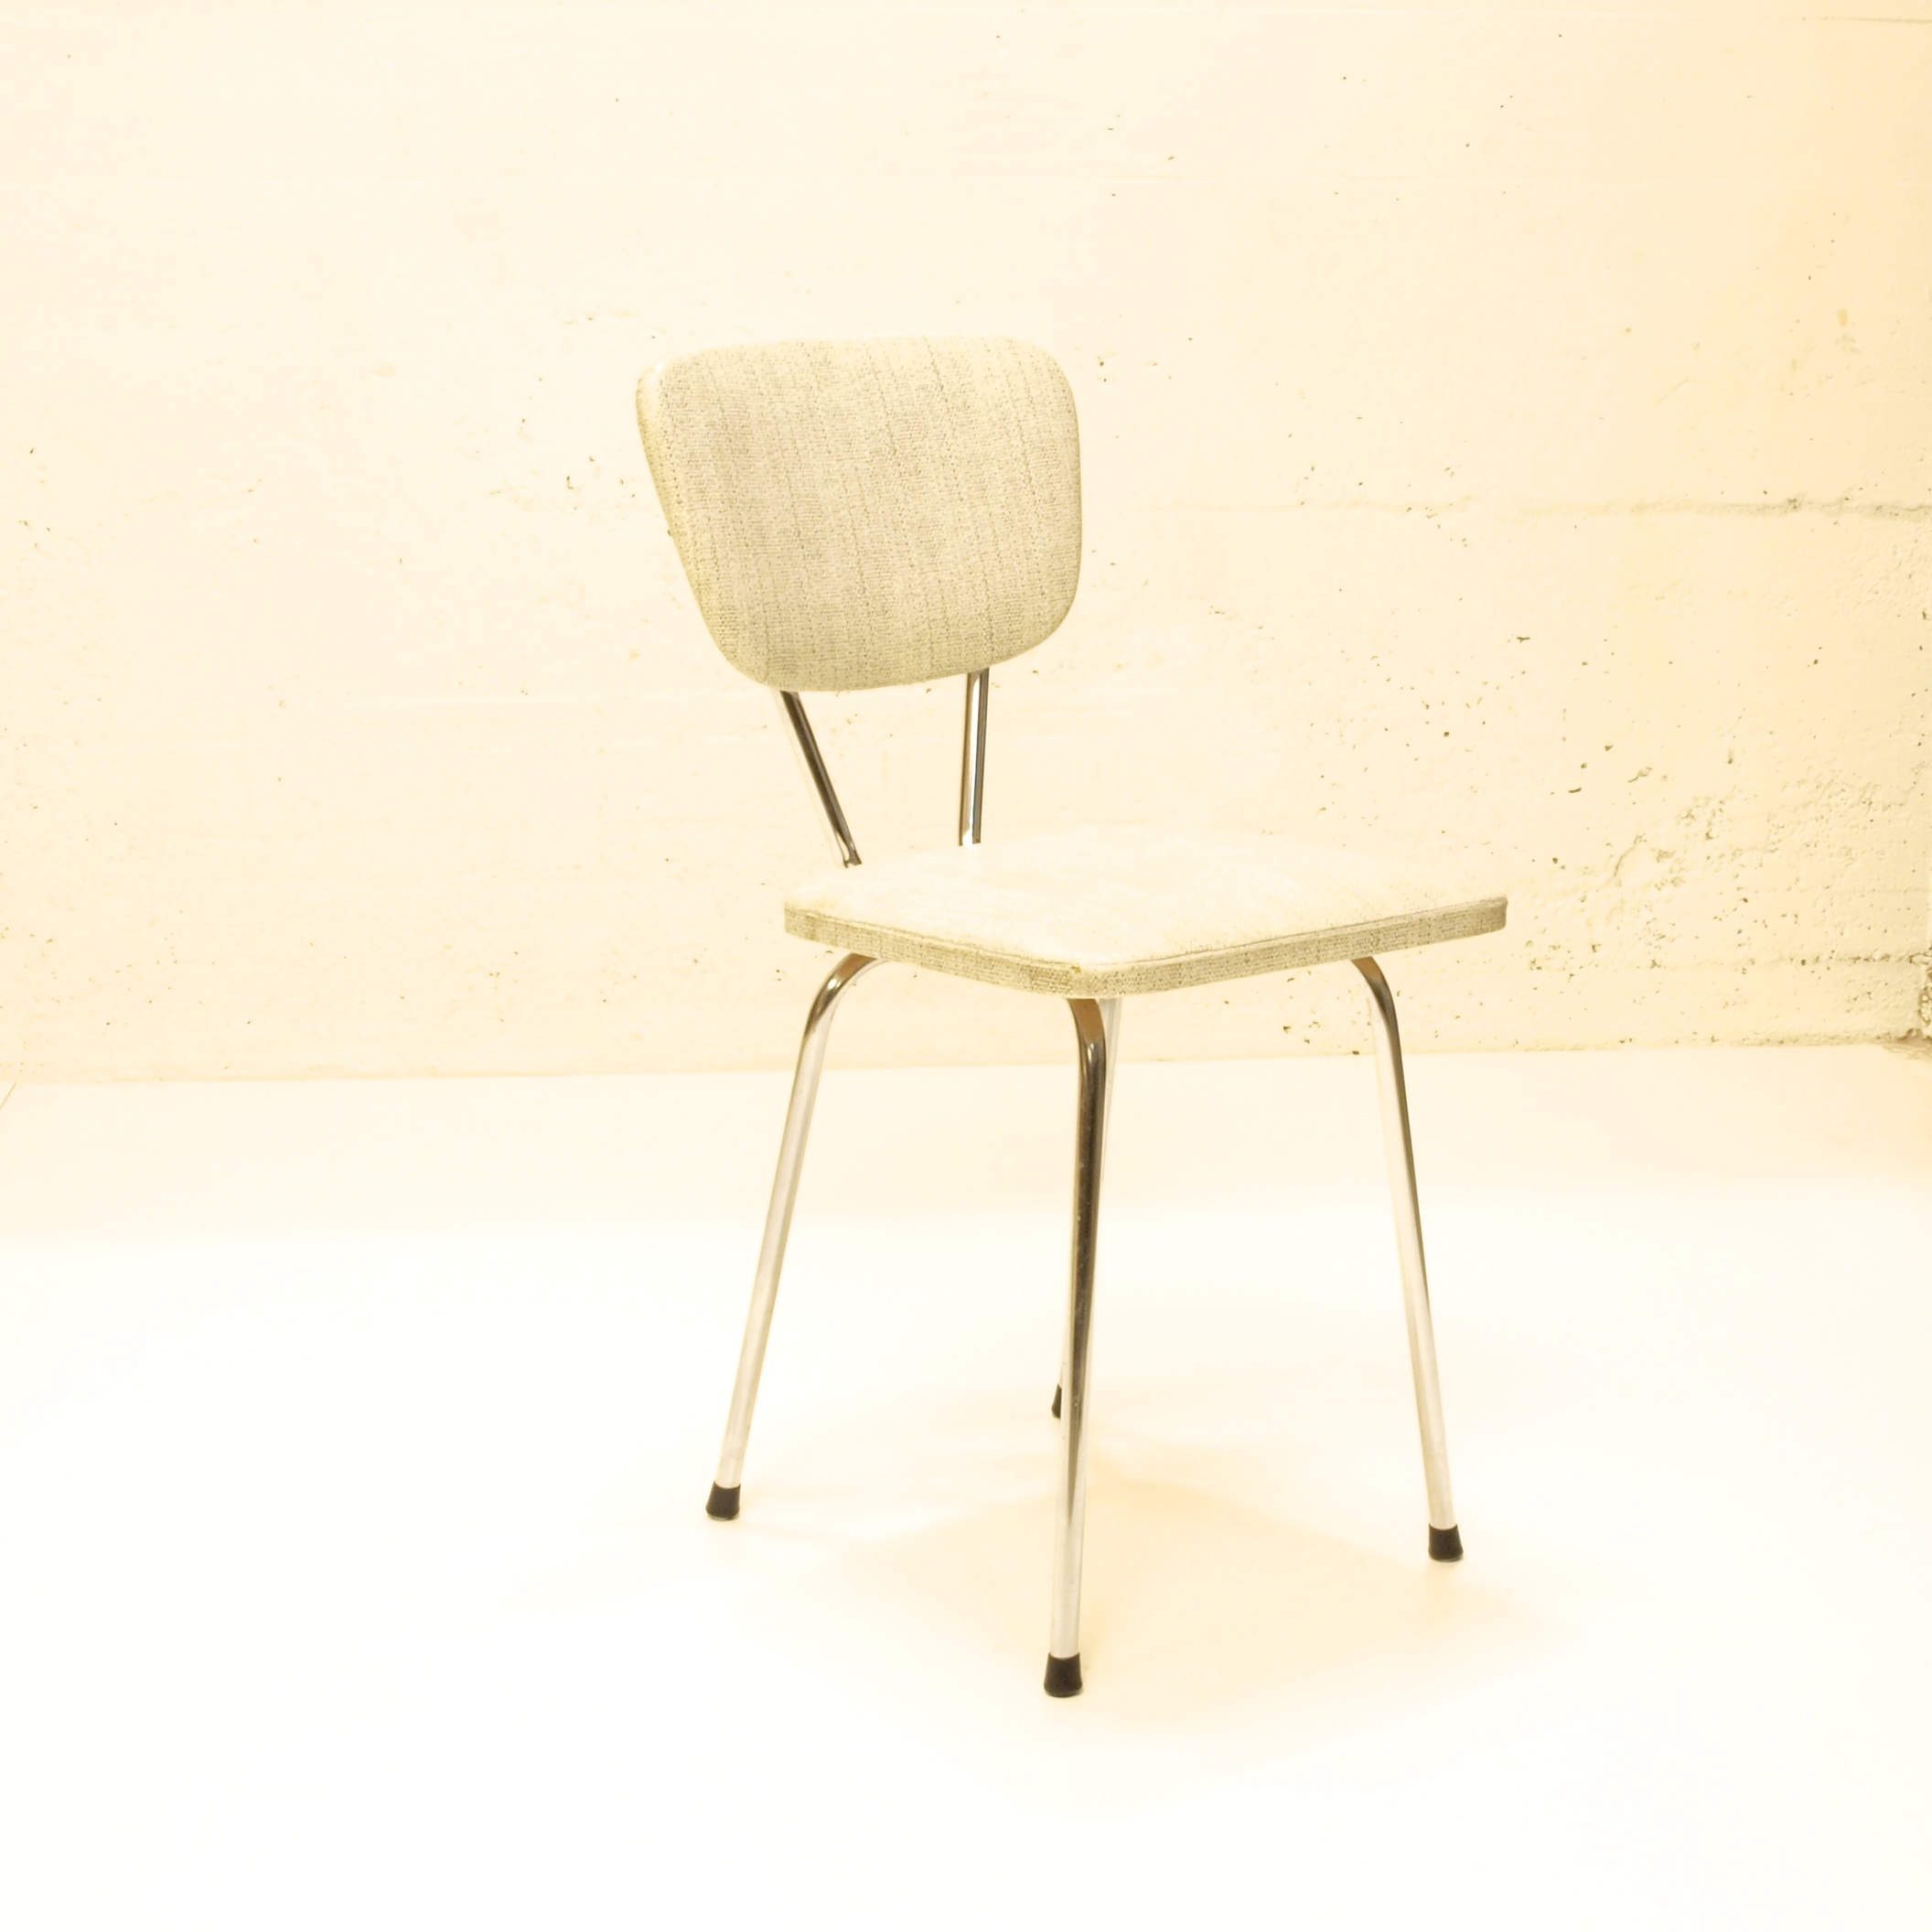 k chenstuhl gepolstert weiss grau meliert 2 stk m bel. Black Bedroom Furniture Sets. Home Design Ideas